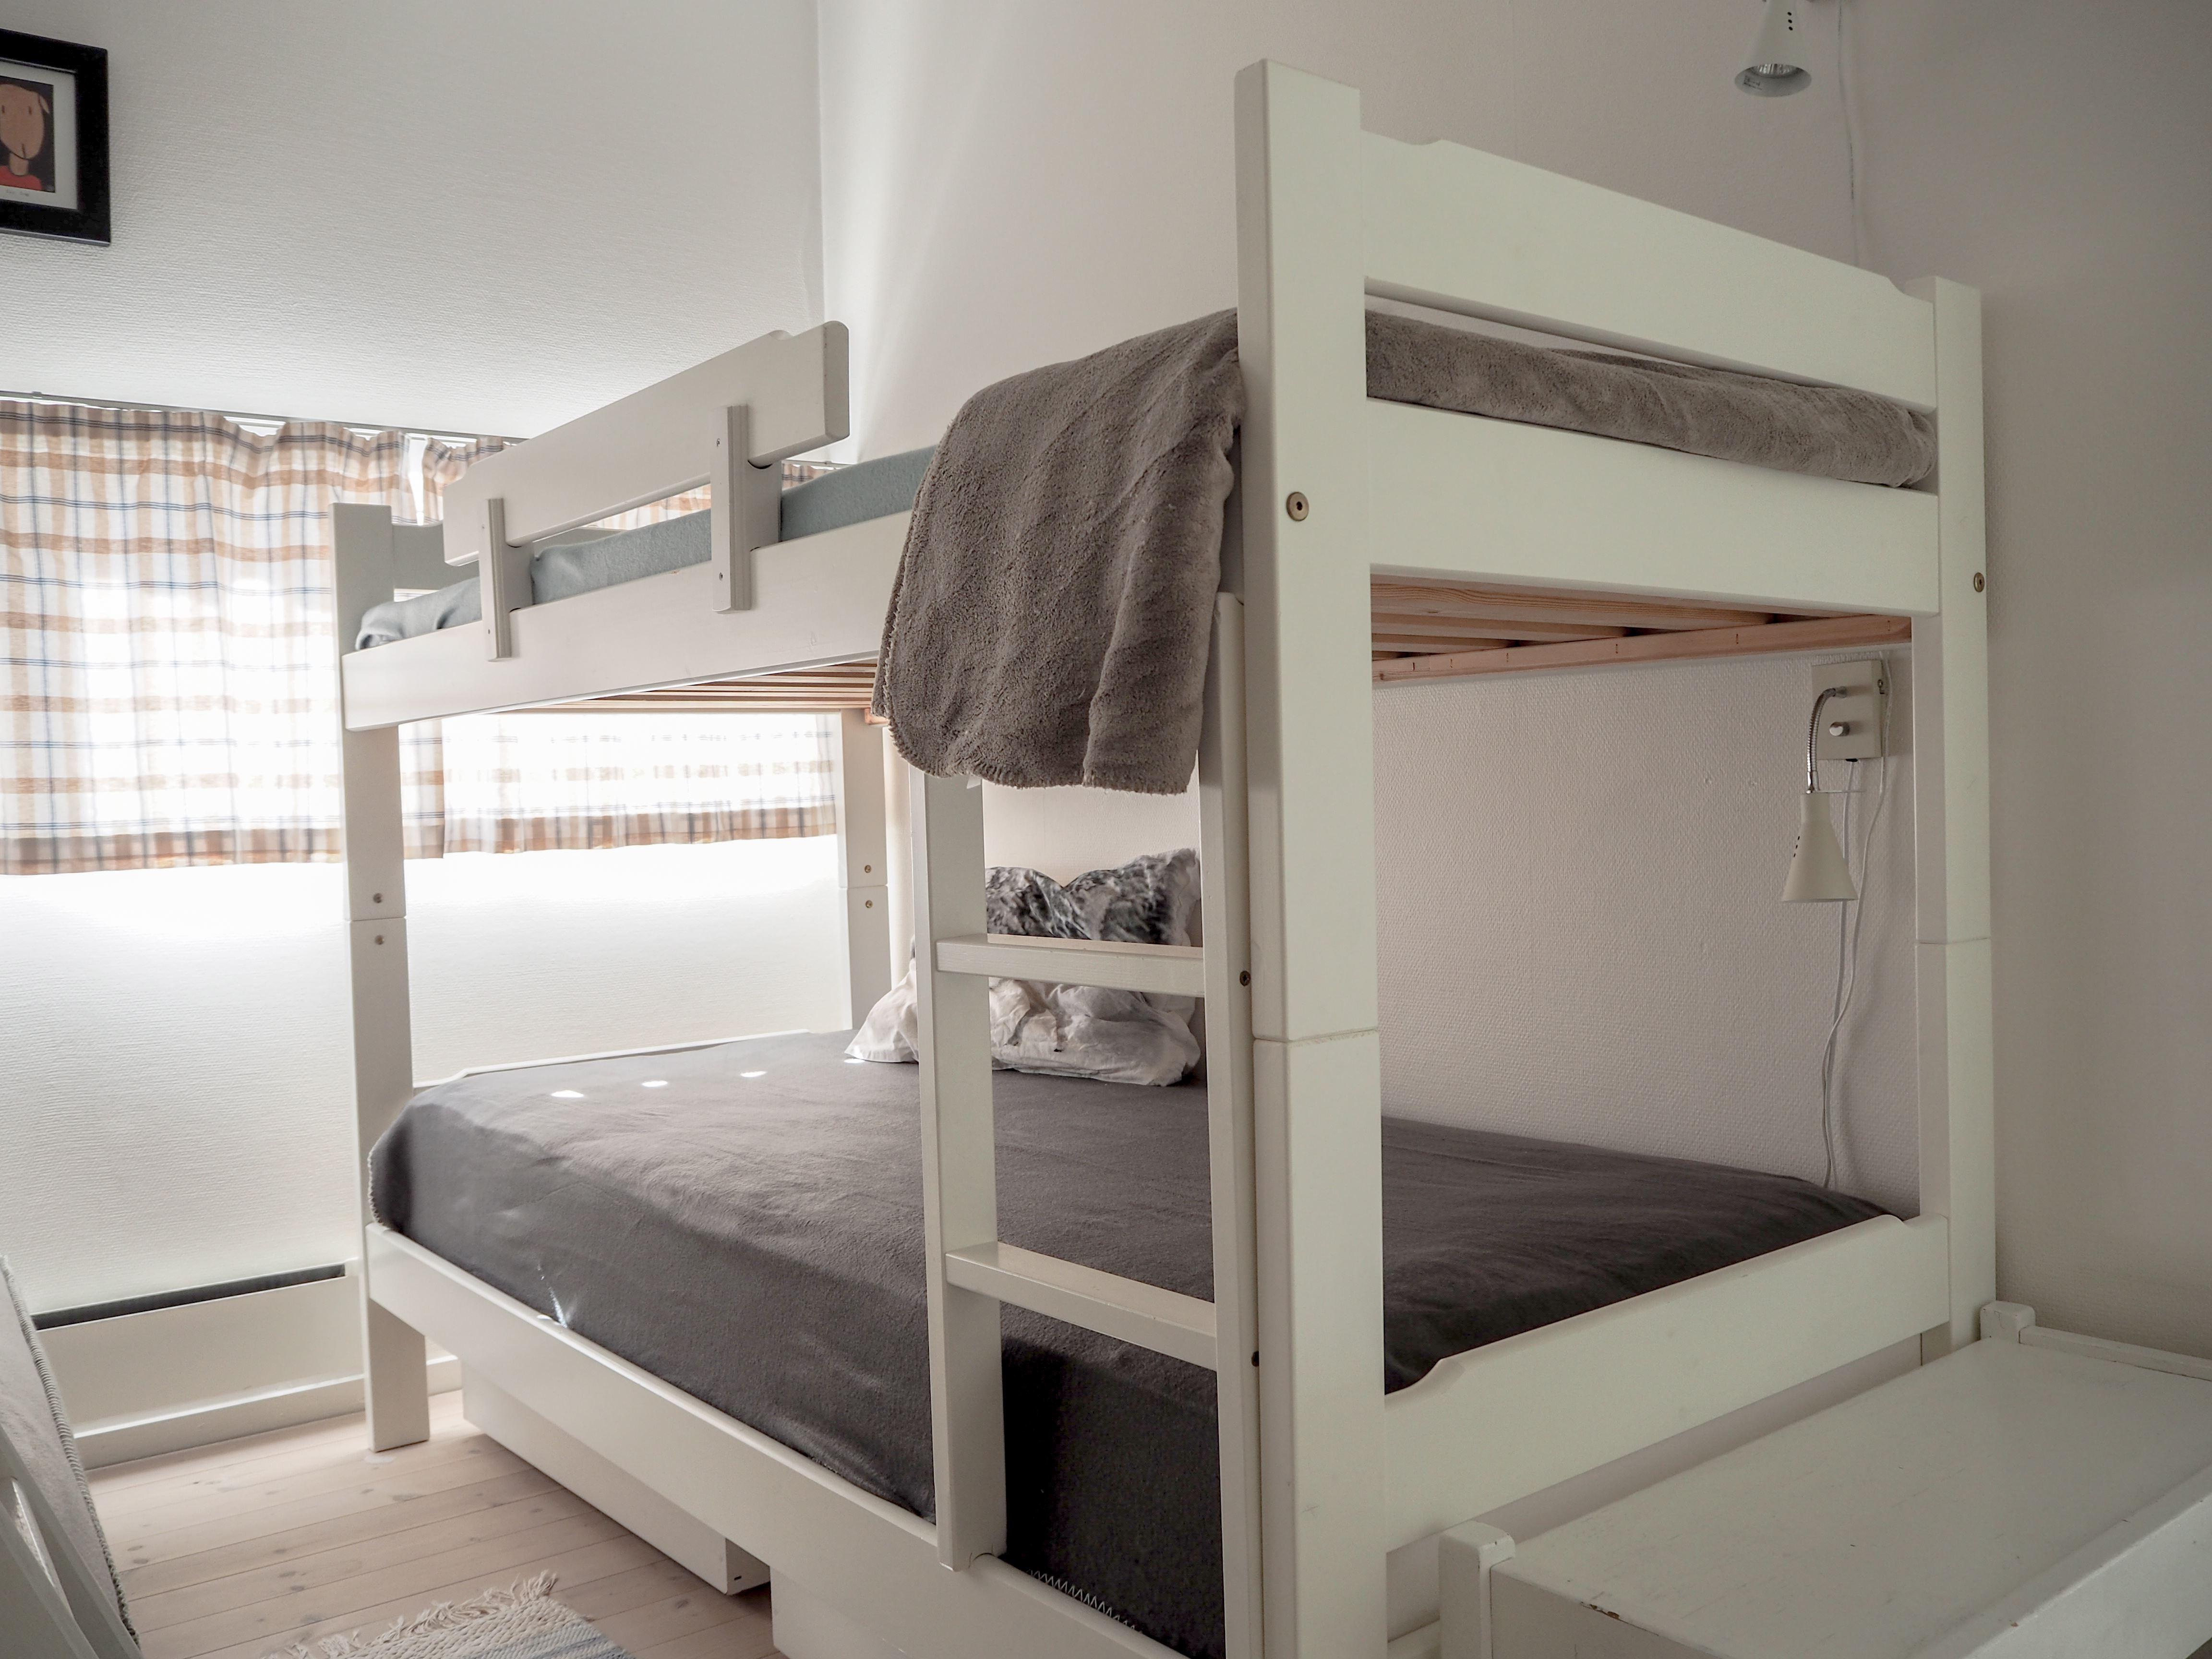 Leilighet 221 / Apartment 221